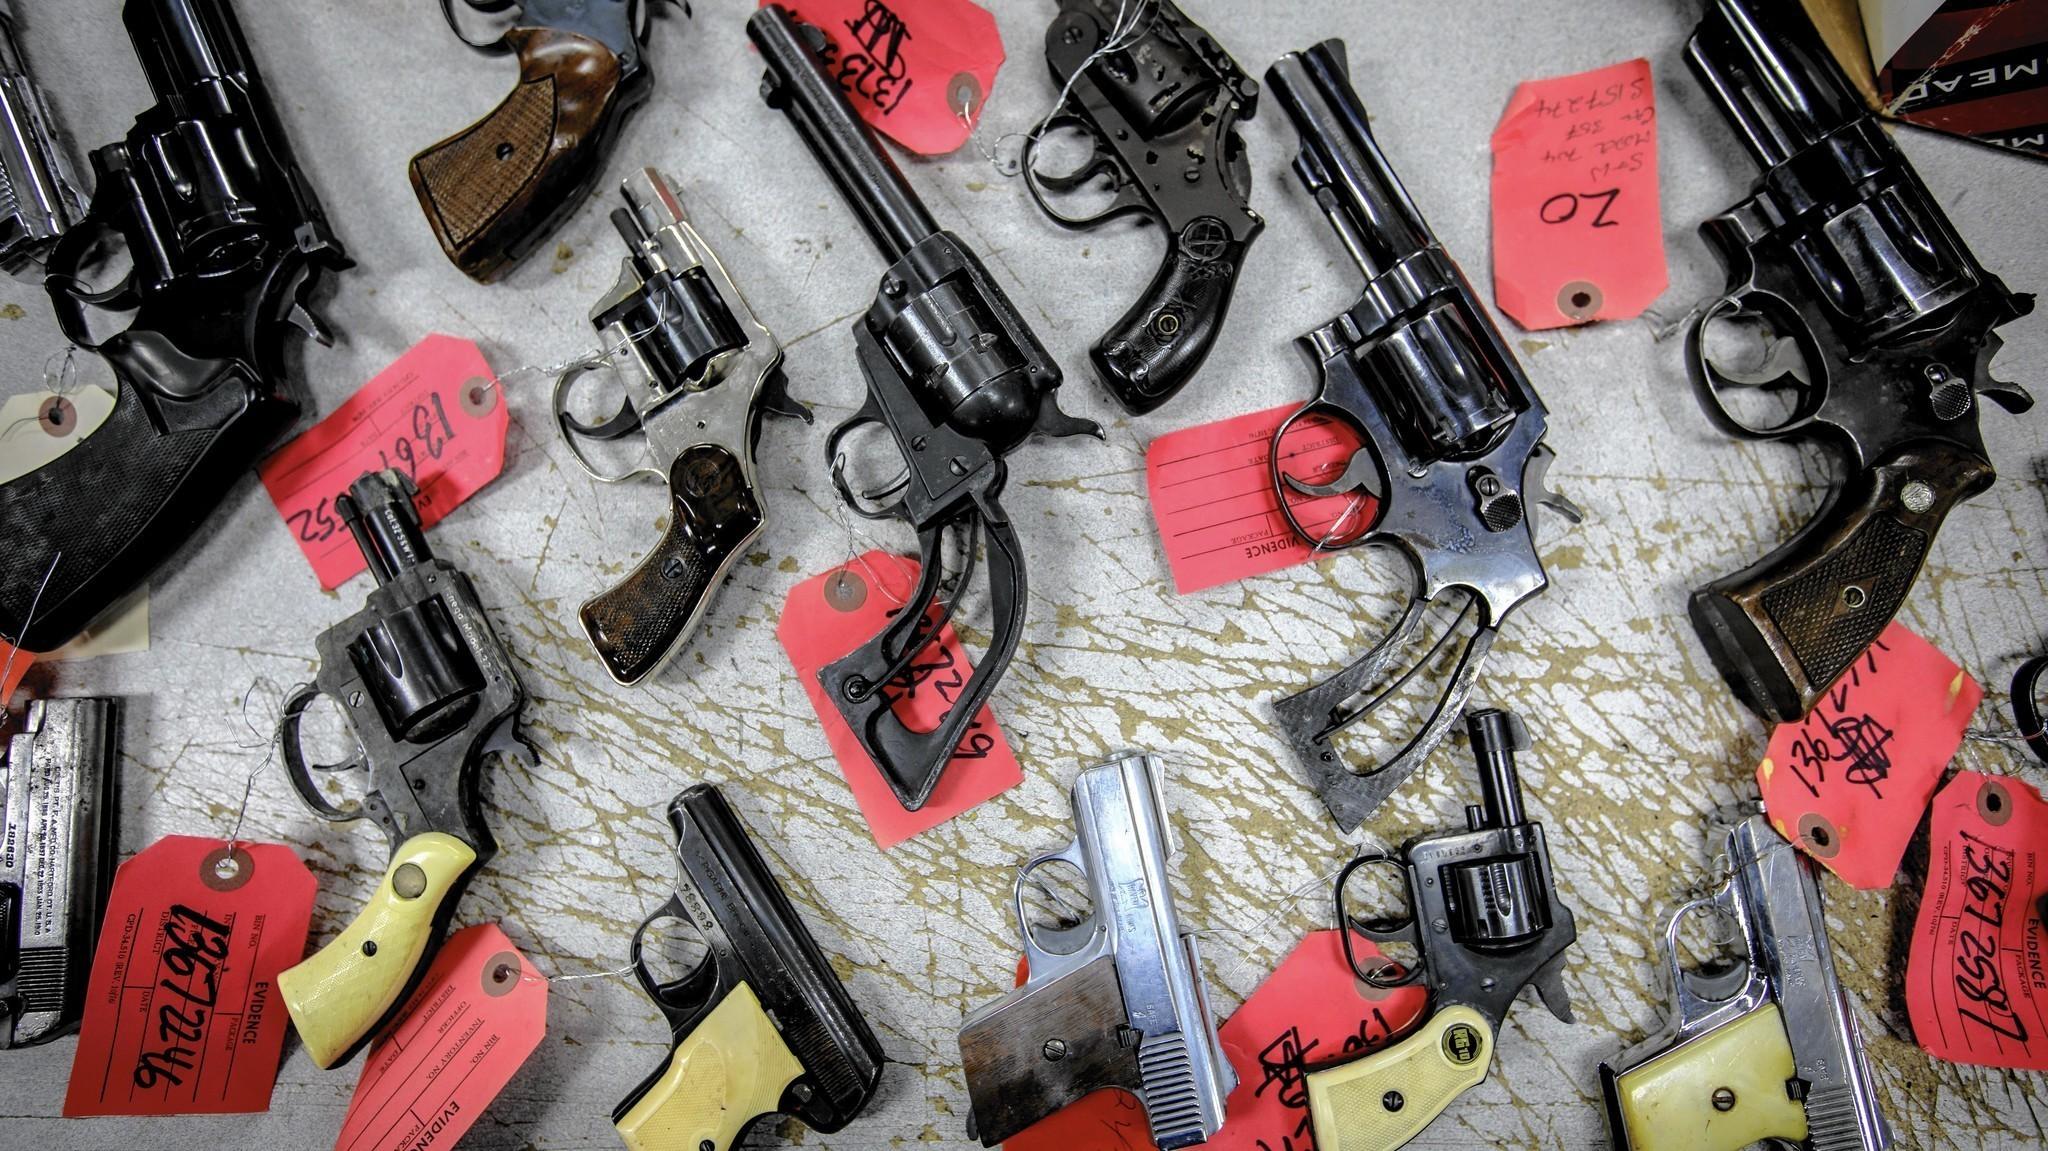 16 Percent Of Seriously Injured Gunshot Victims Not